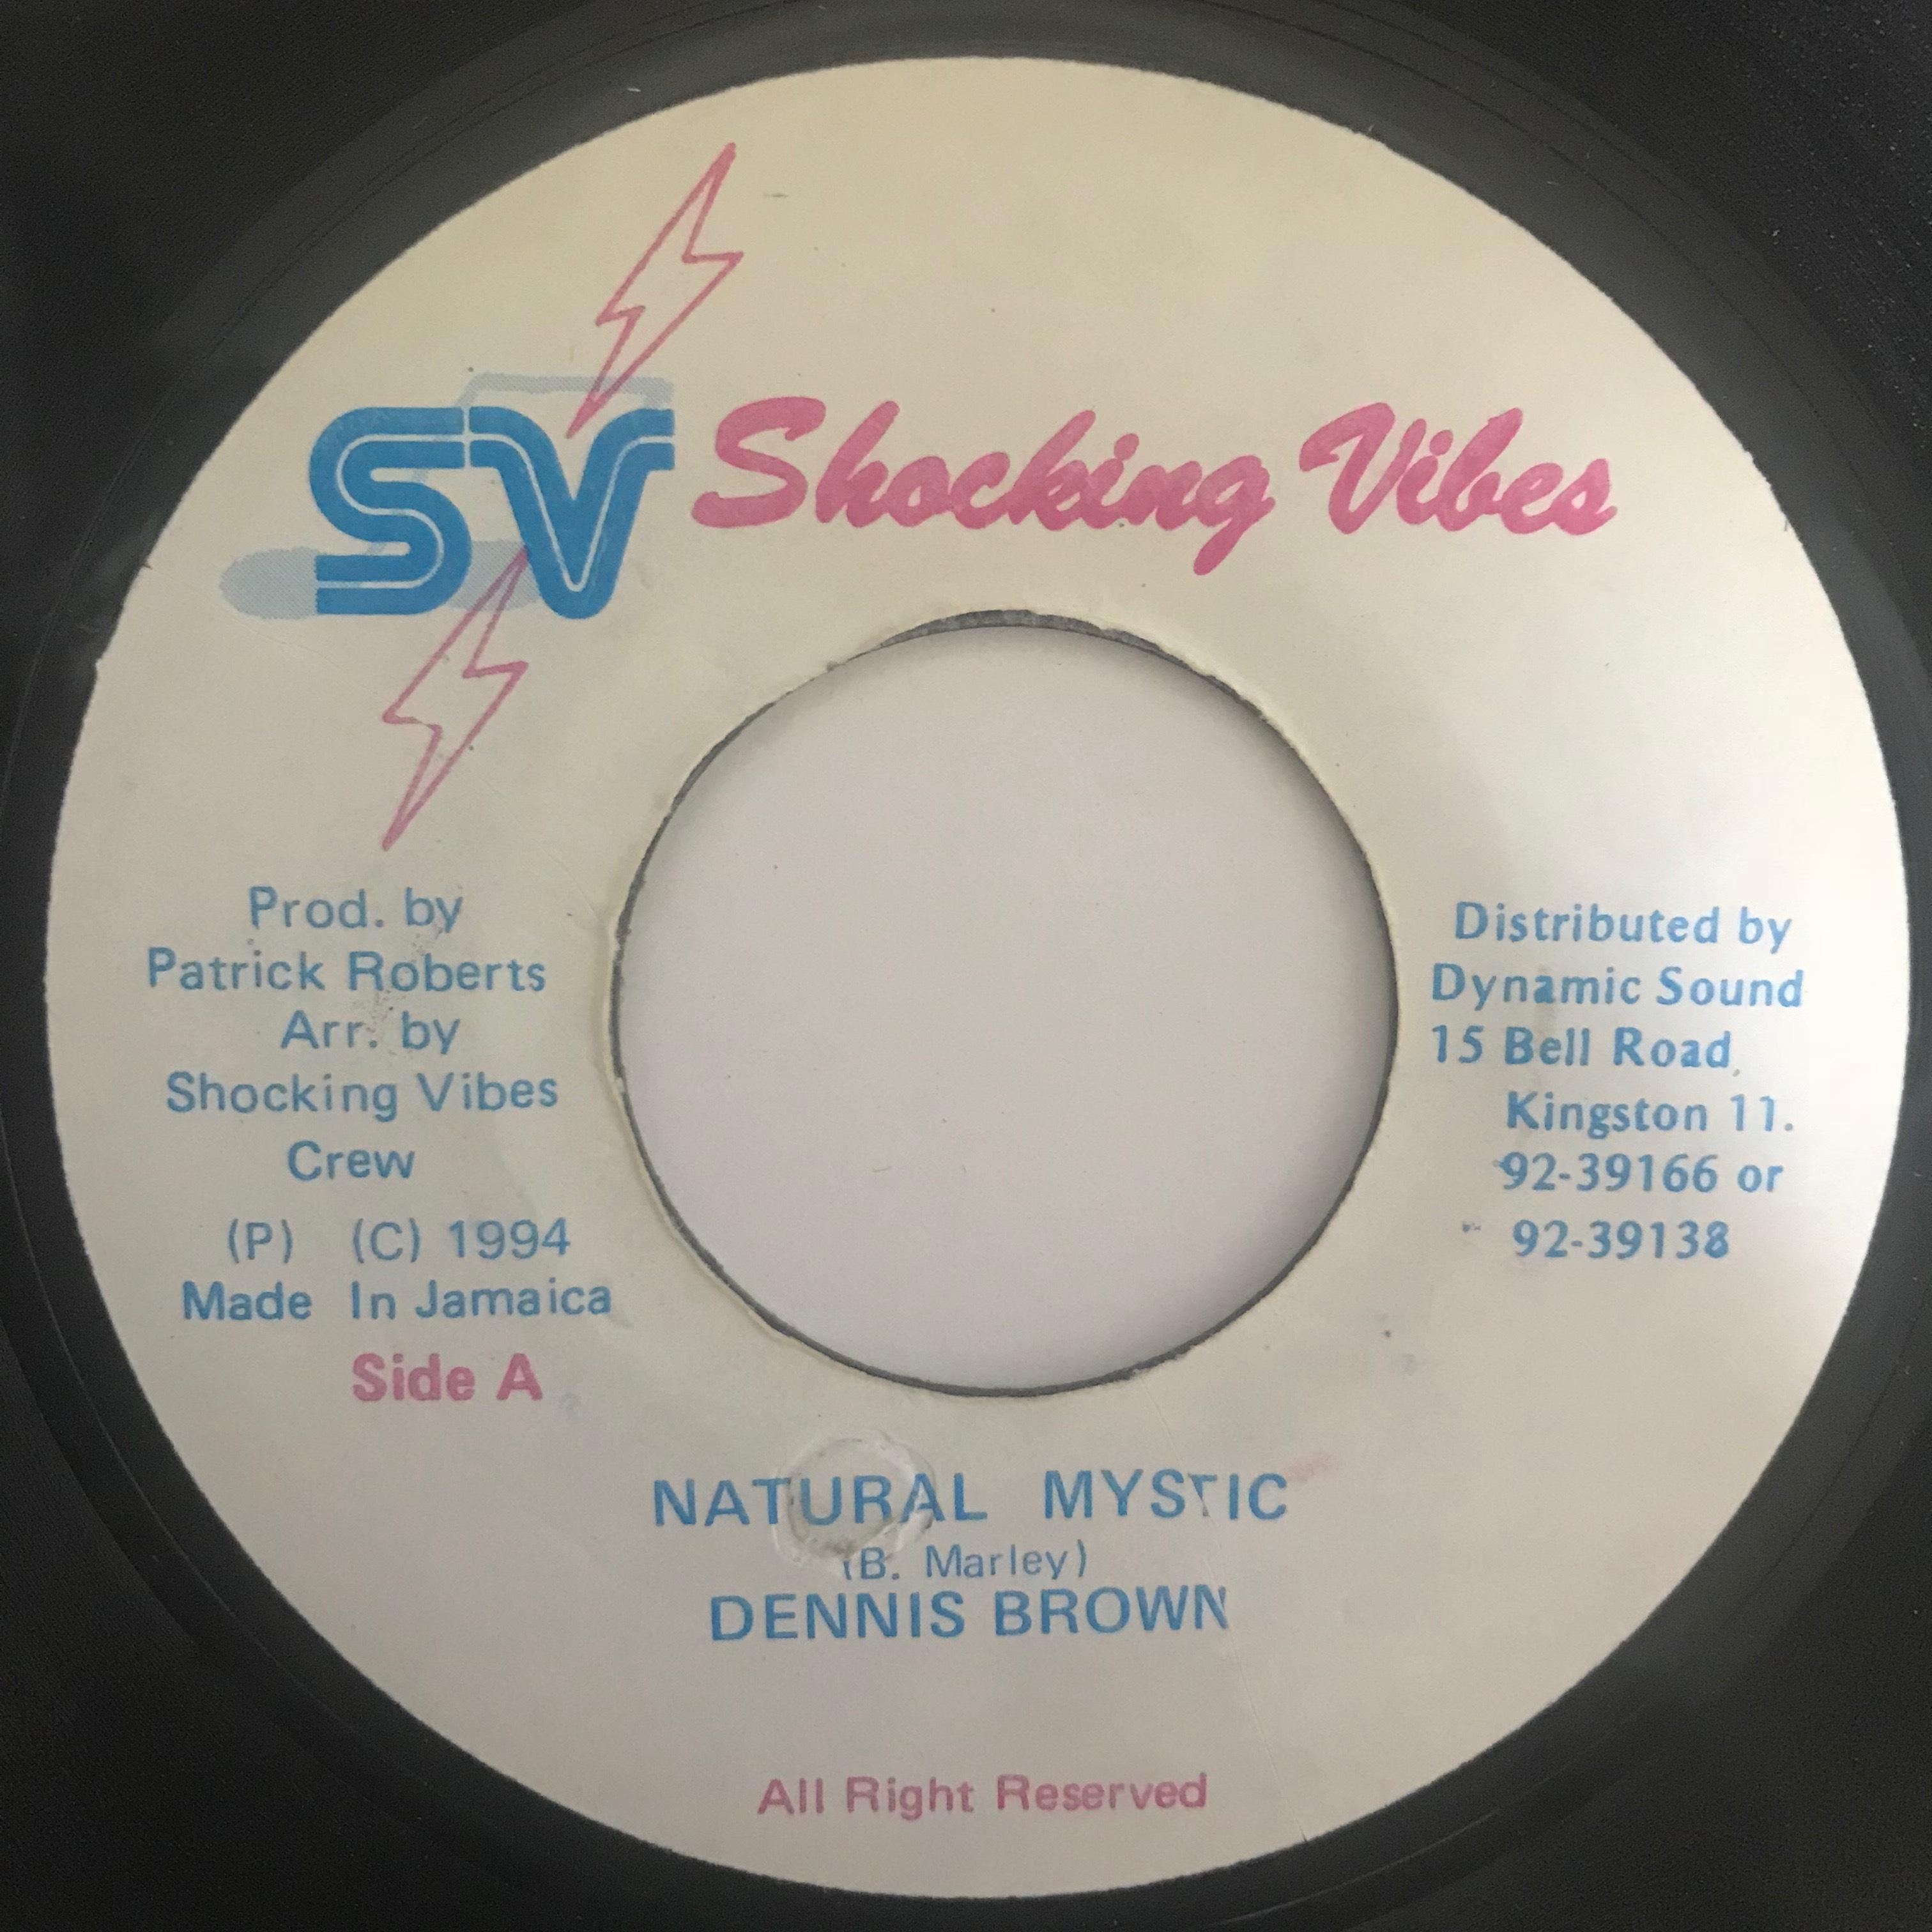 Dennis Brown (デニス ブラウン) - Natural Mystic【7-10766】